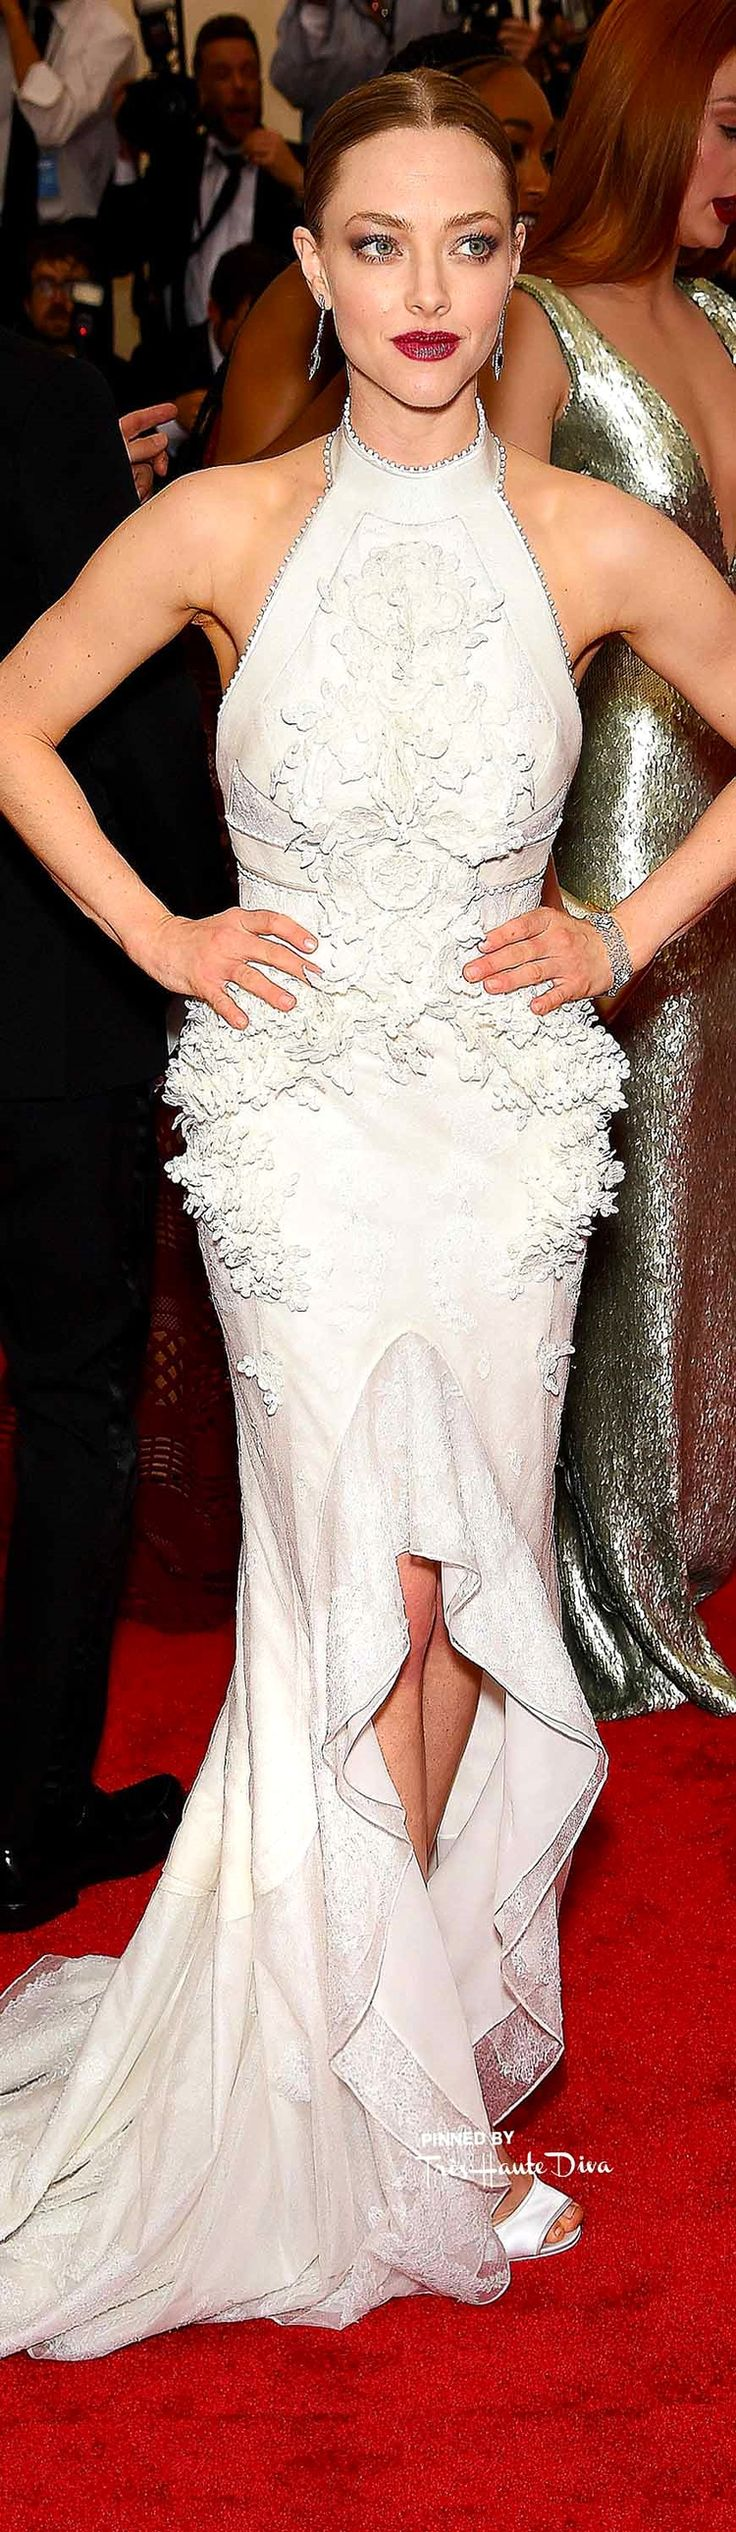 Amanda Seyfried in Givenchy Haute Couture ♔ Très Haute Diva ♔